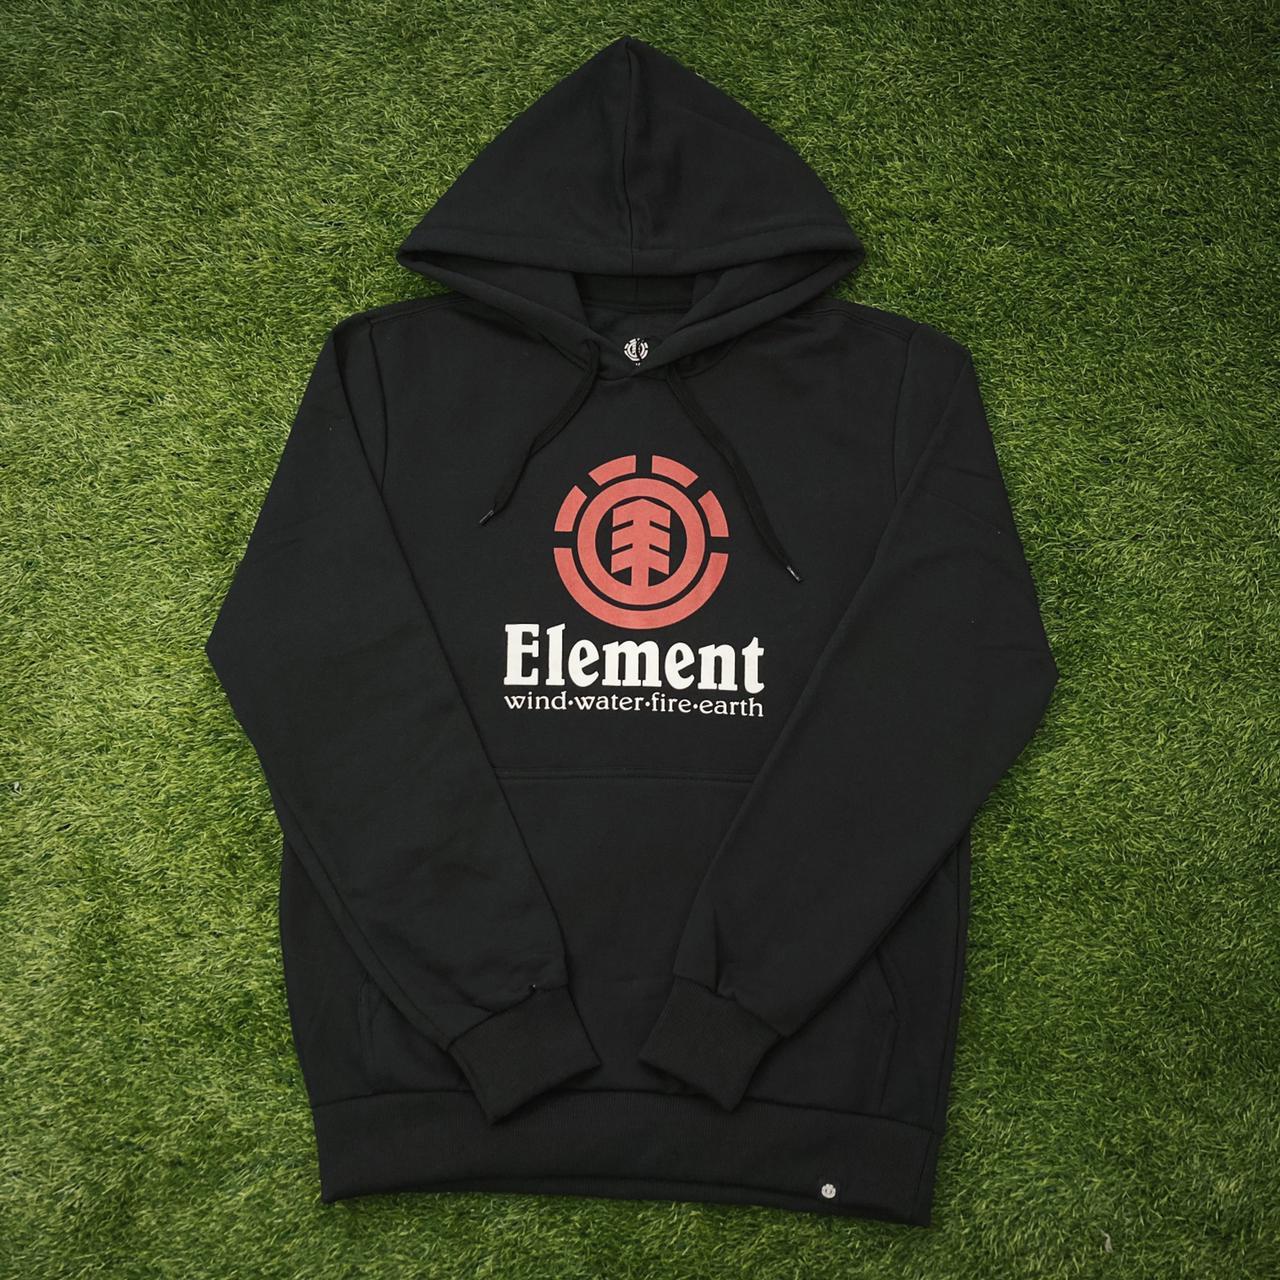 Blusa moletom element fechado vertical preto